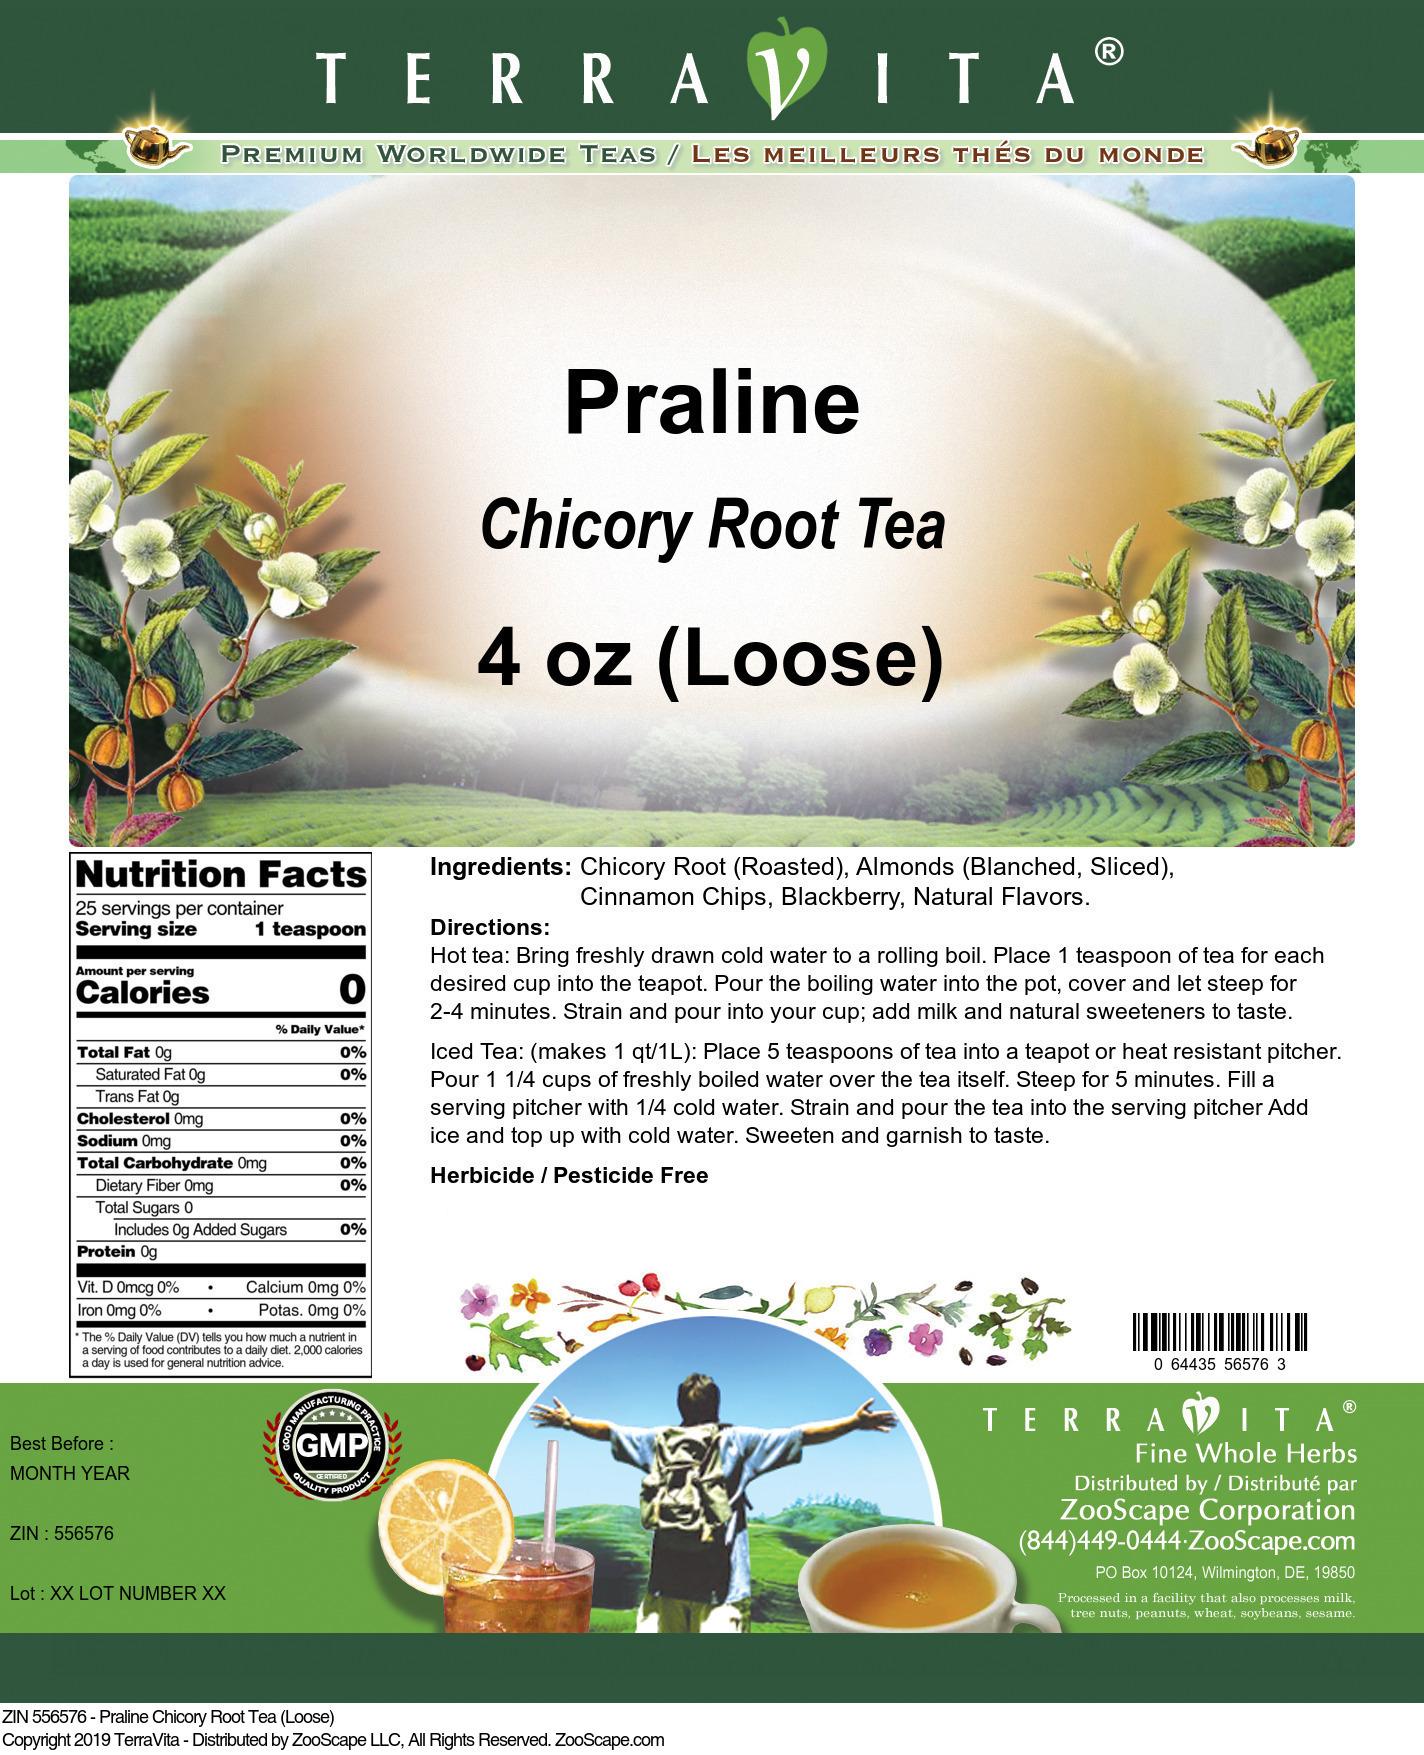 Praline Chicory Root Tea (Loose)